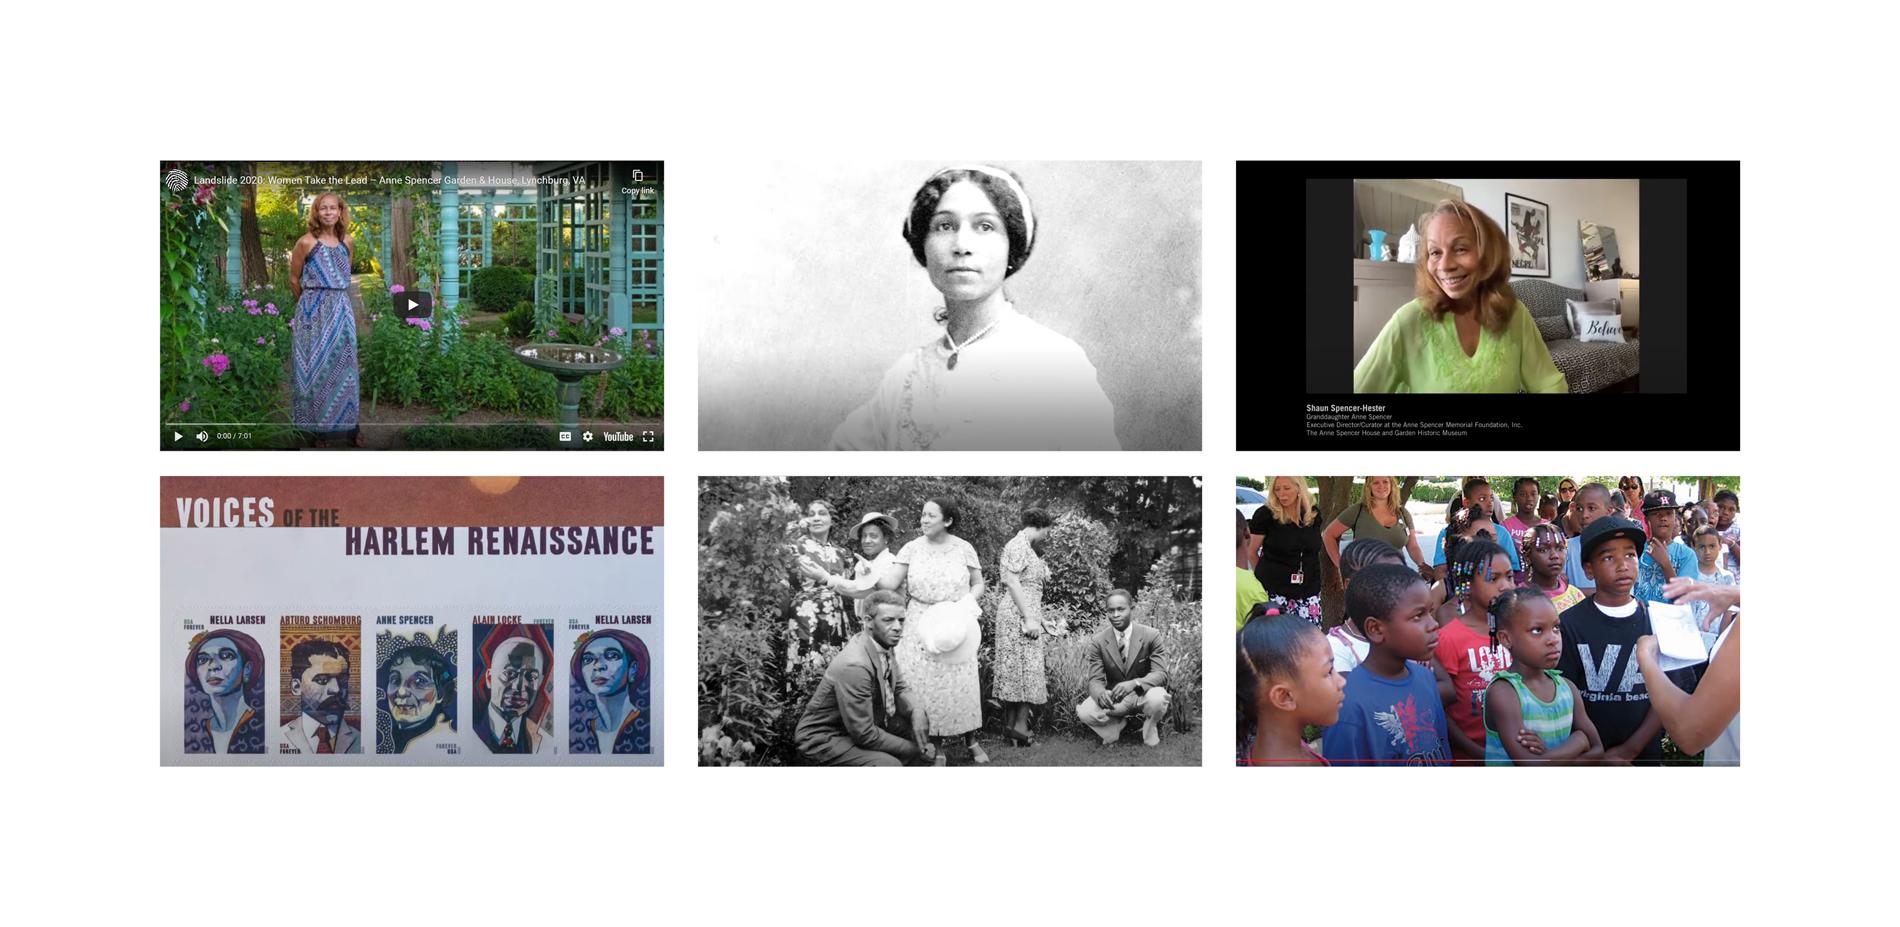 Landslide 2020: Women Take the Lead - Landslide 2020 screen grabs about Anne Spencer